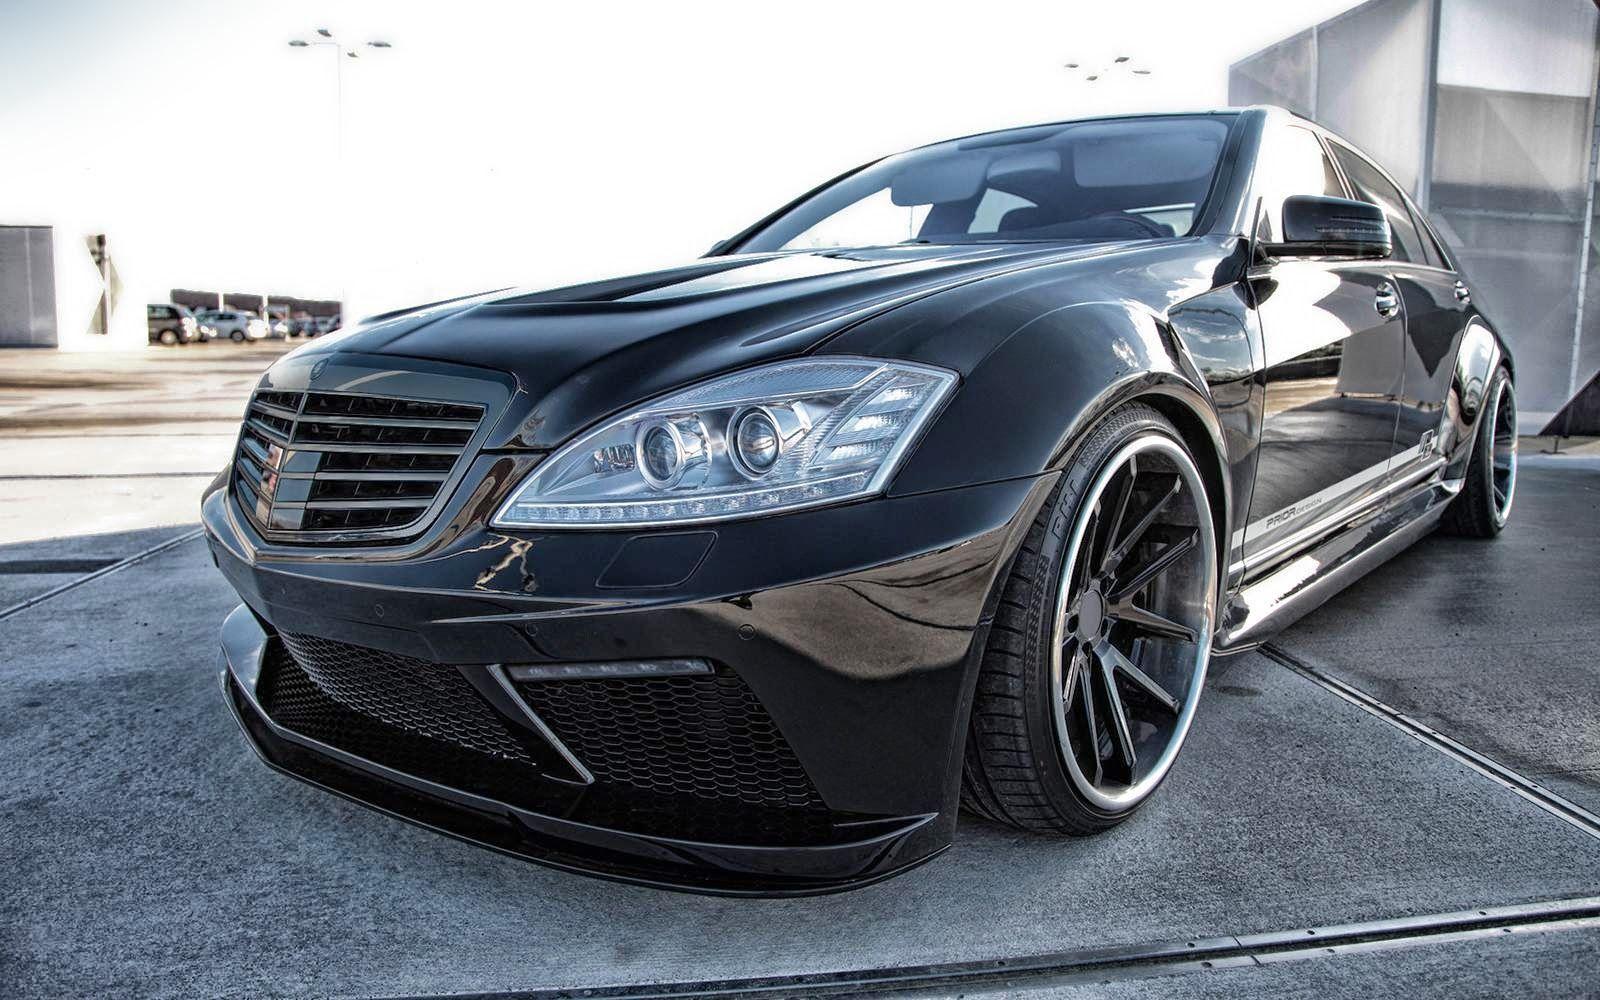 MercedesBenz W221 SClass VIP Style by Prior Design